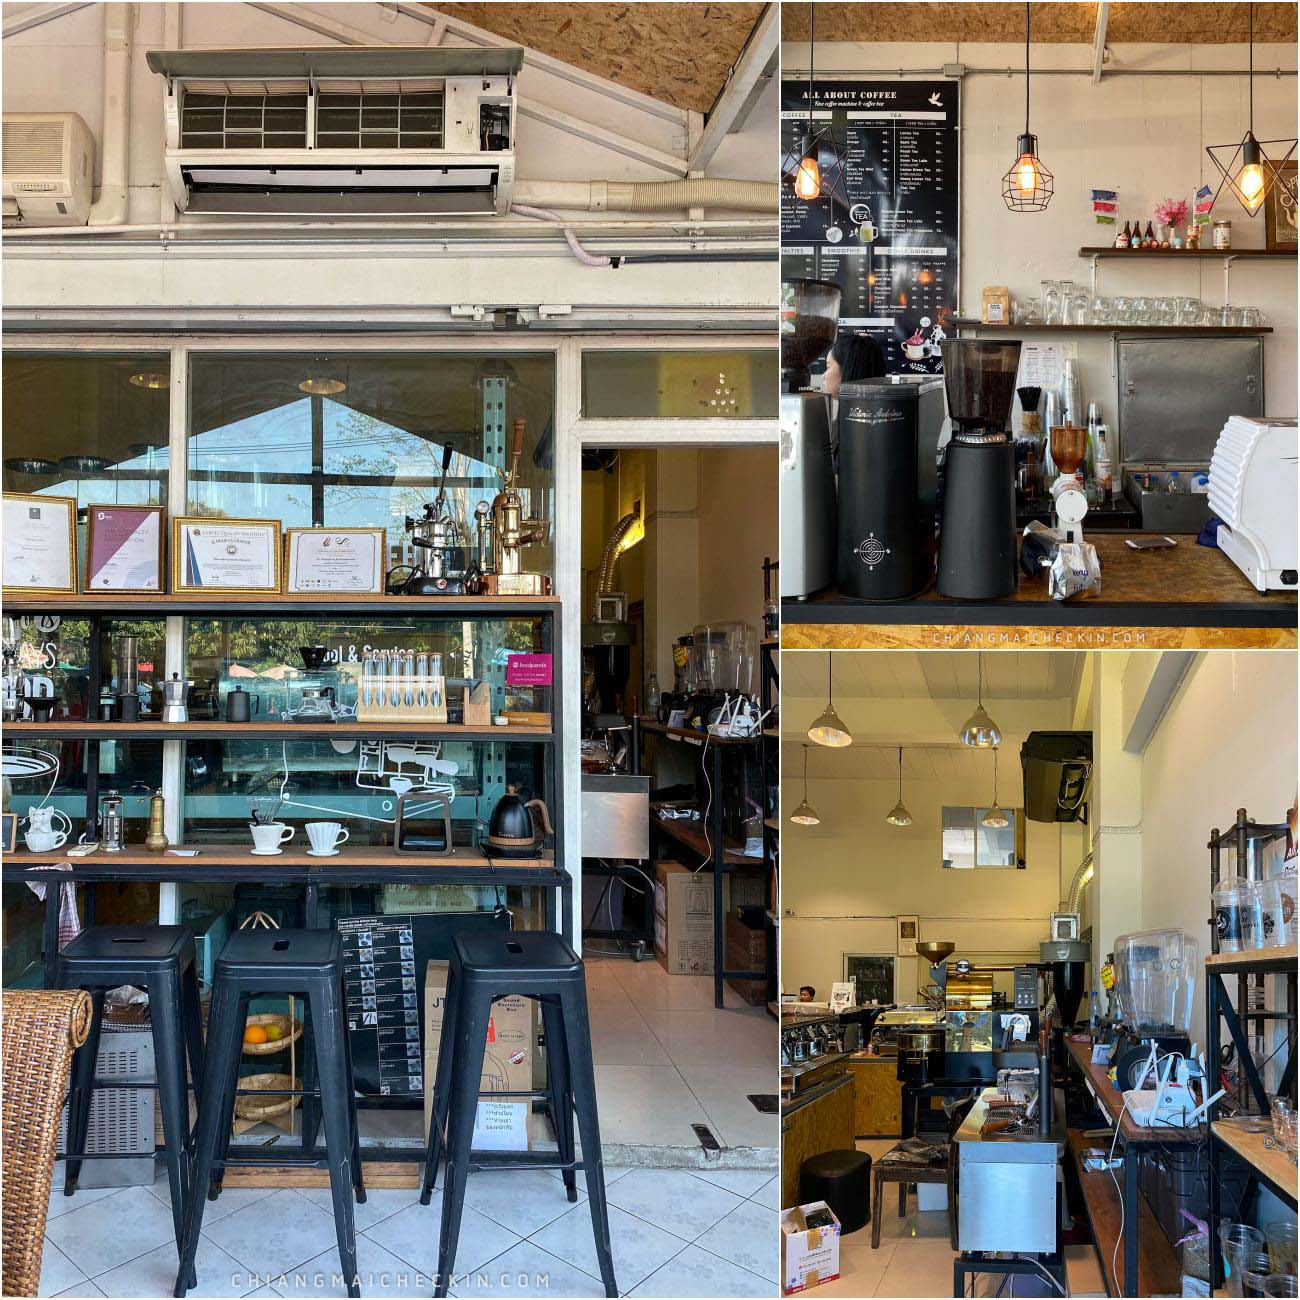 all about coffee ร้านกาแฟสุดโมเดิร์นสุดน่ารักฟรุ้งฟริ้ง มีมุมถ่ายรูปเพียบให้สาวๆได้เลือกถ่าย